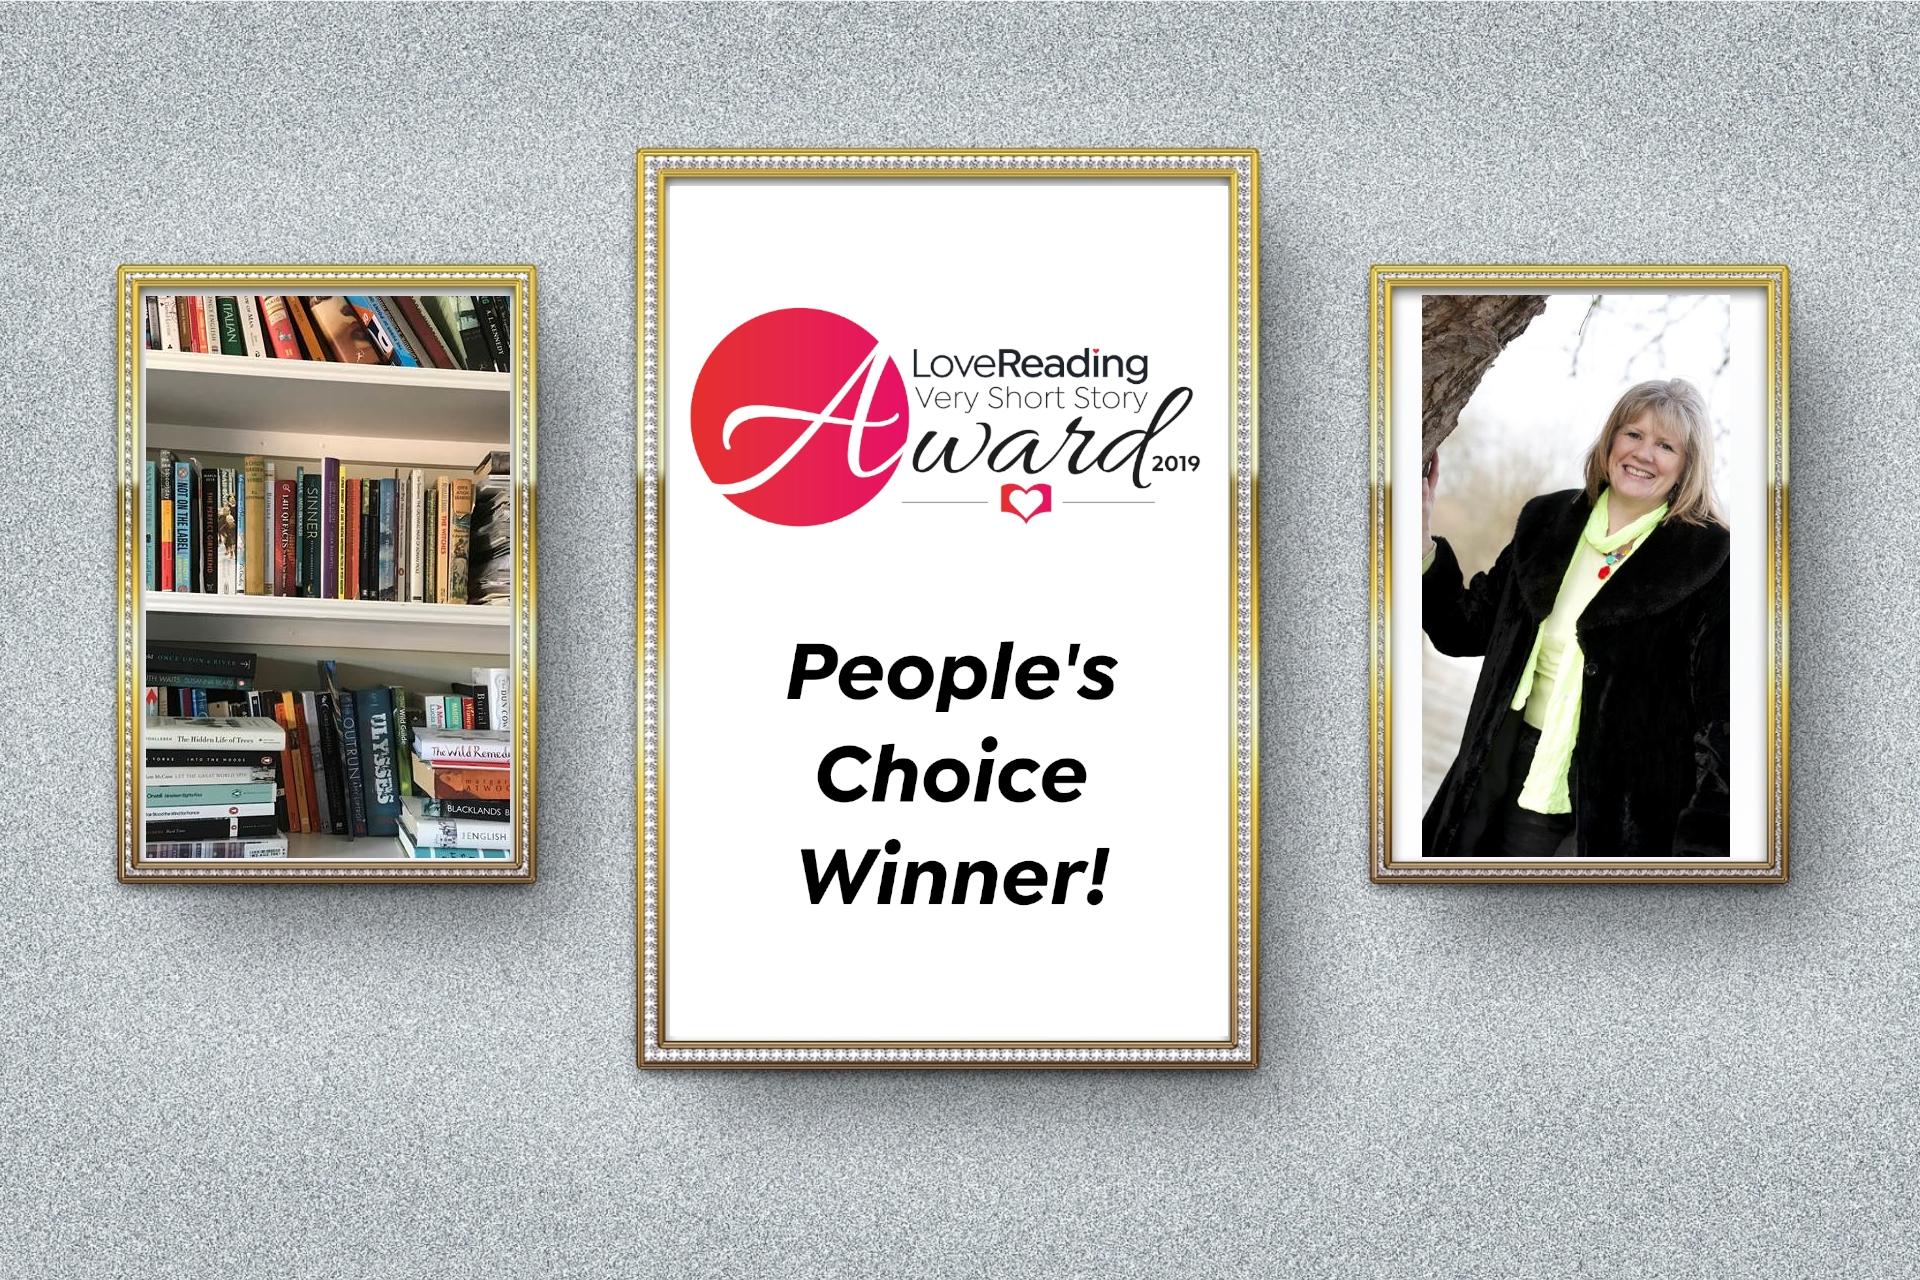 Winner of the LoveReading Very Short Story Award 2019 - People's Choice: Jan Stannard